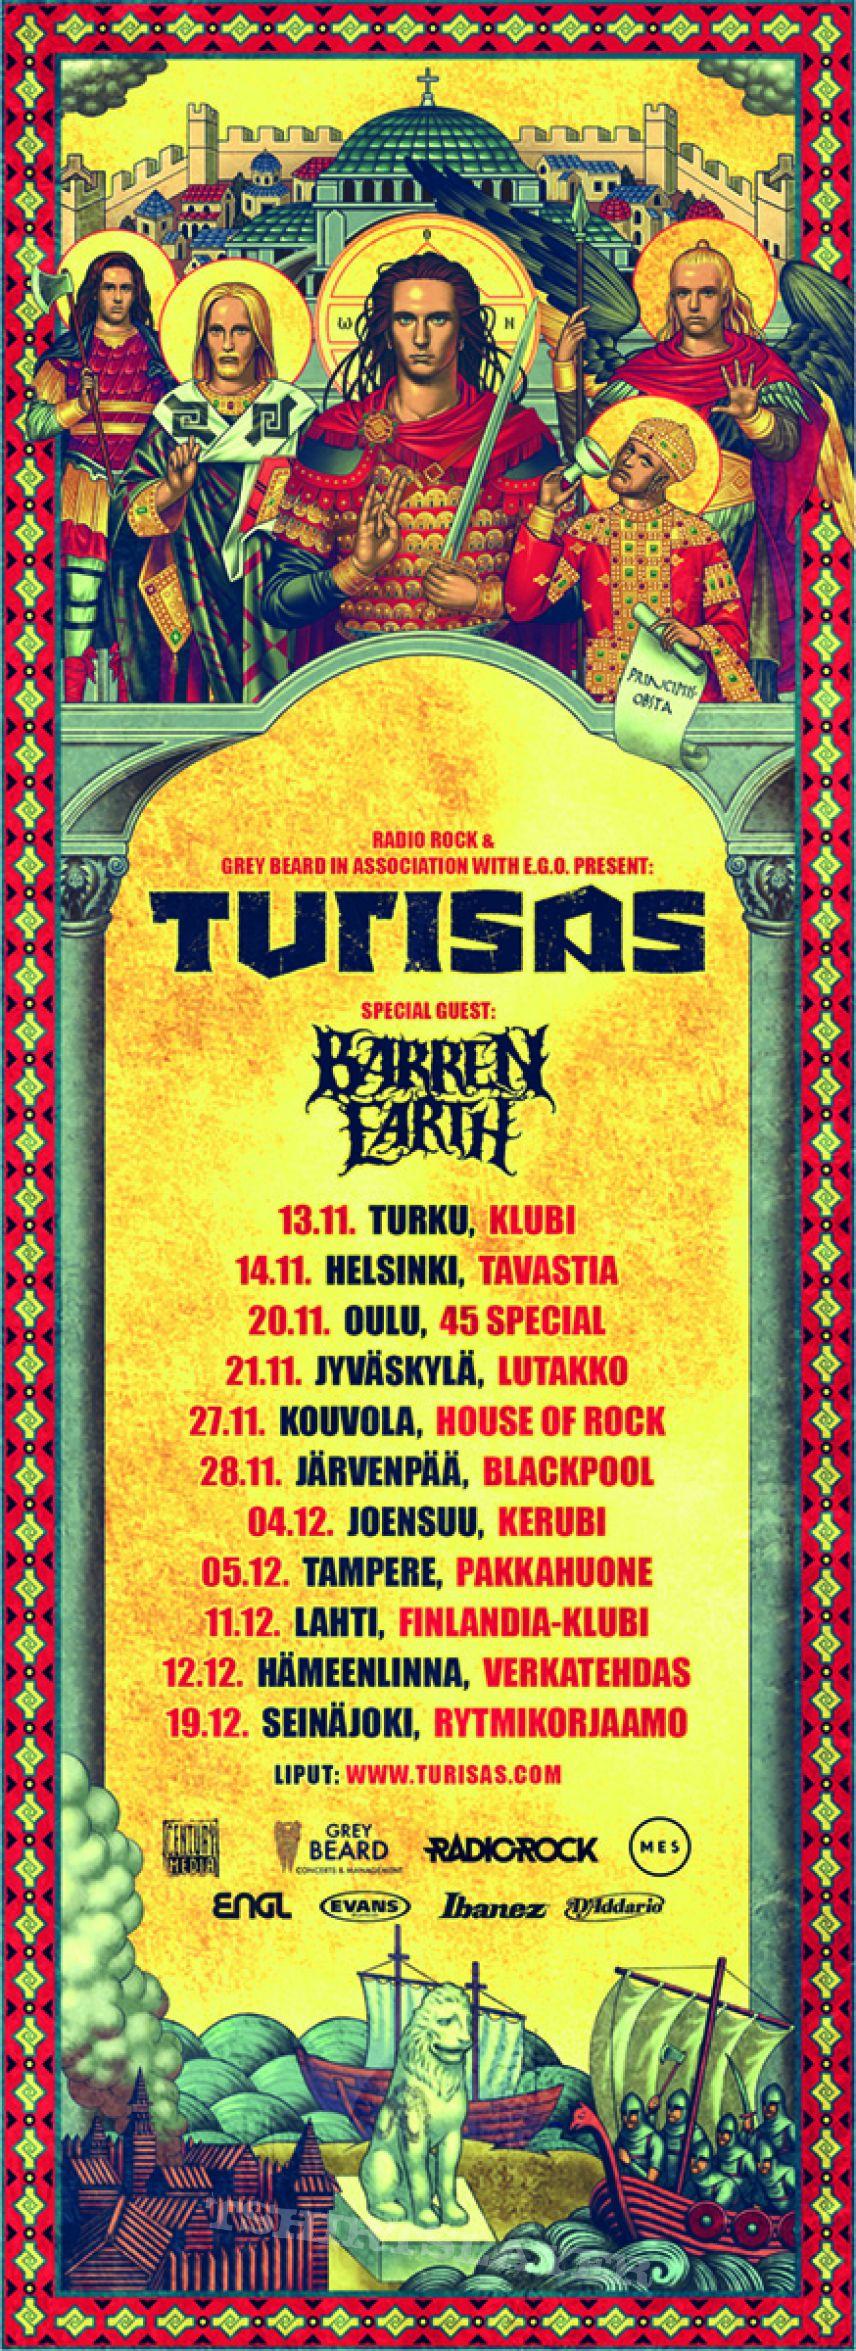 Barren Earth/Turisas Finland tour poster